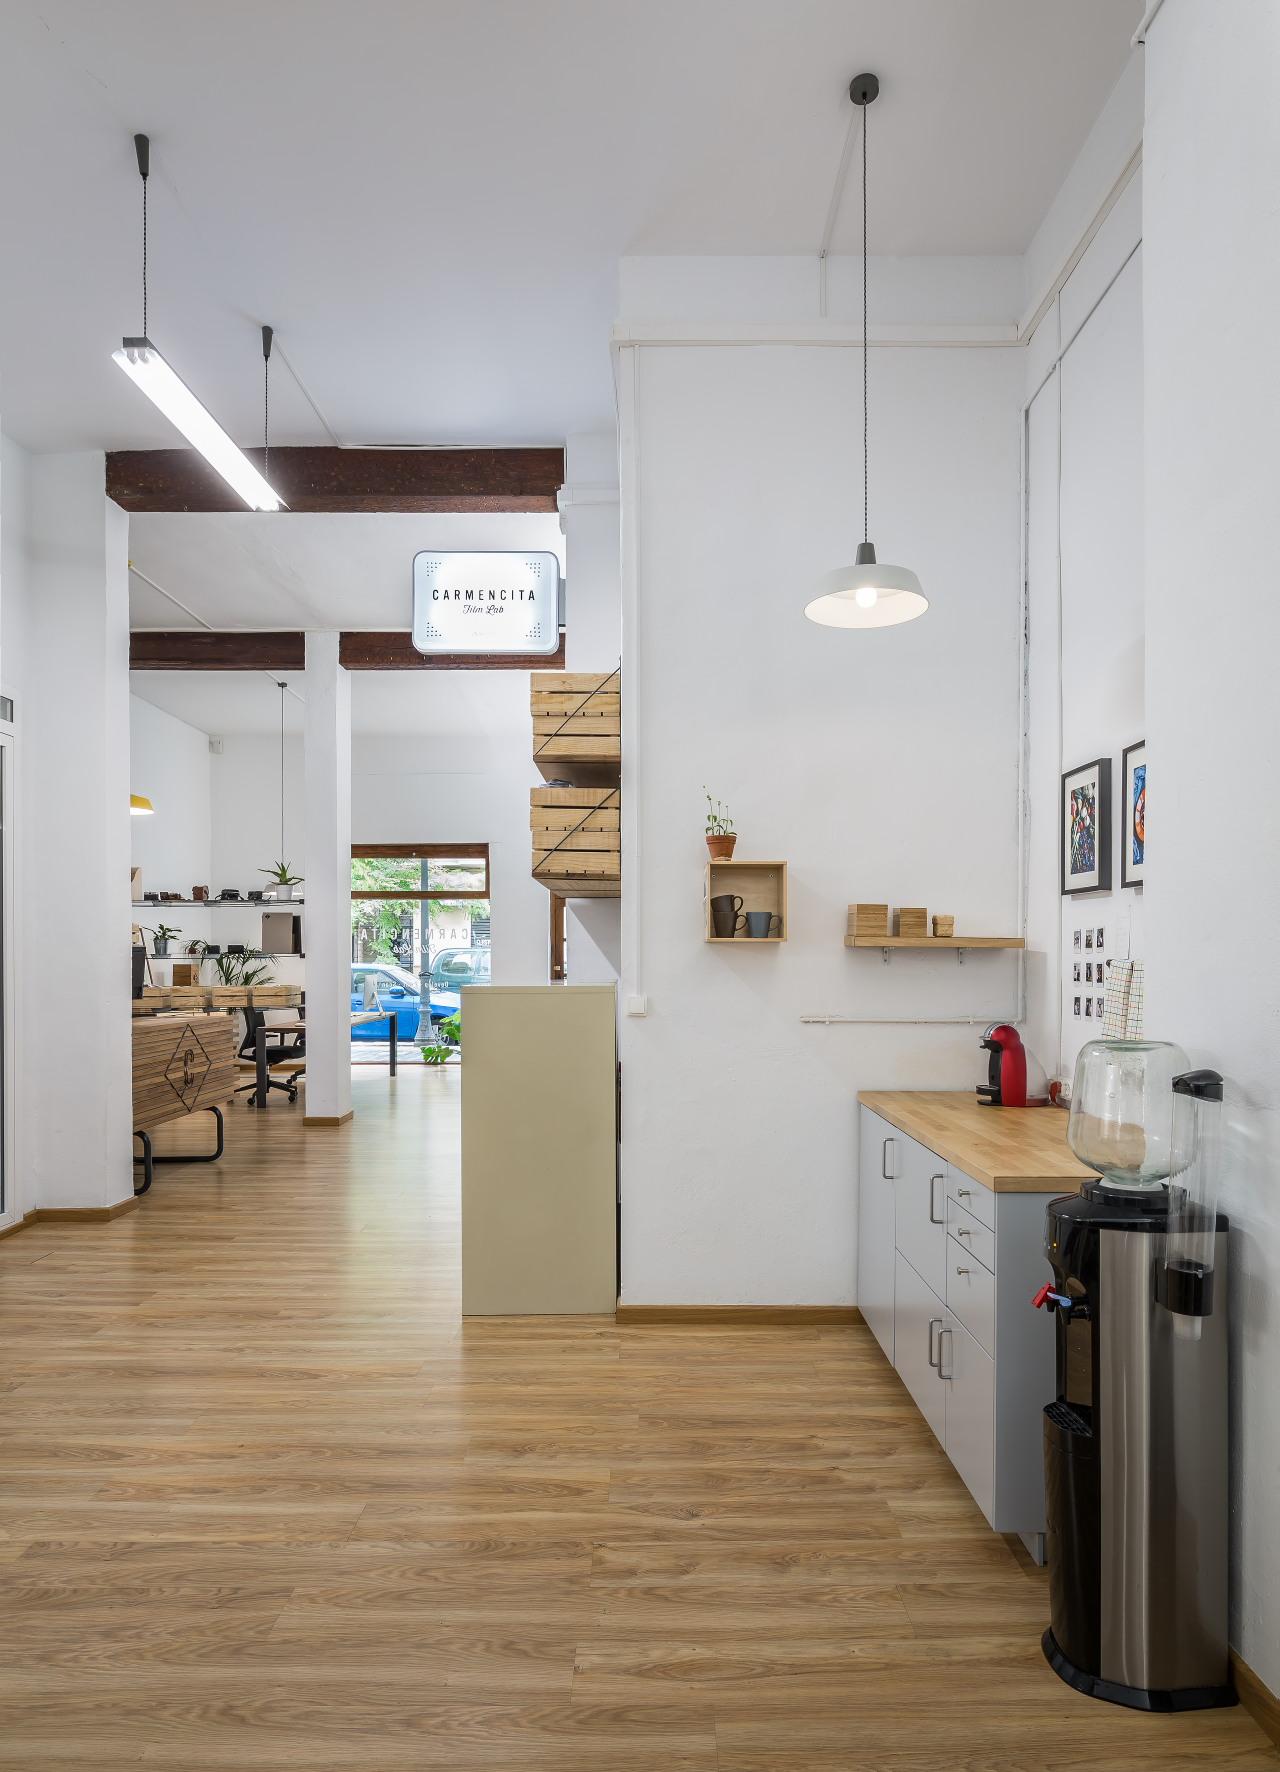 fotografia-arquitectura-interiorismo-valencia-german-cabo-boubau-carmencita-carmencitafilmlab (18)